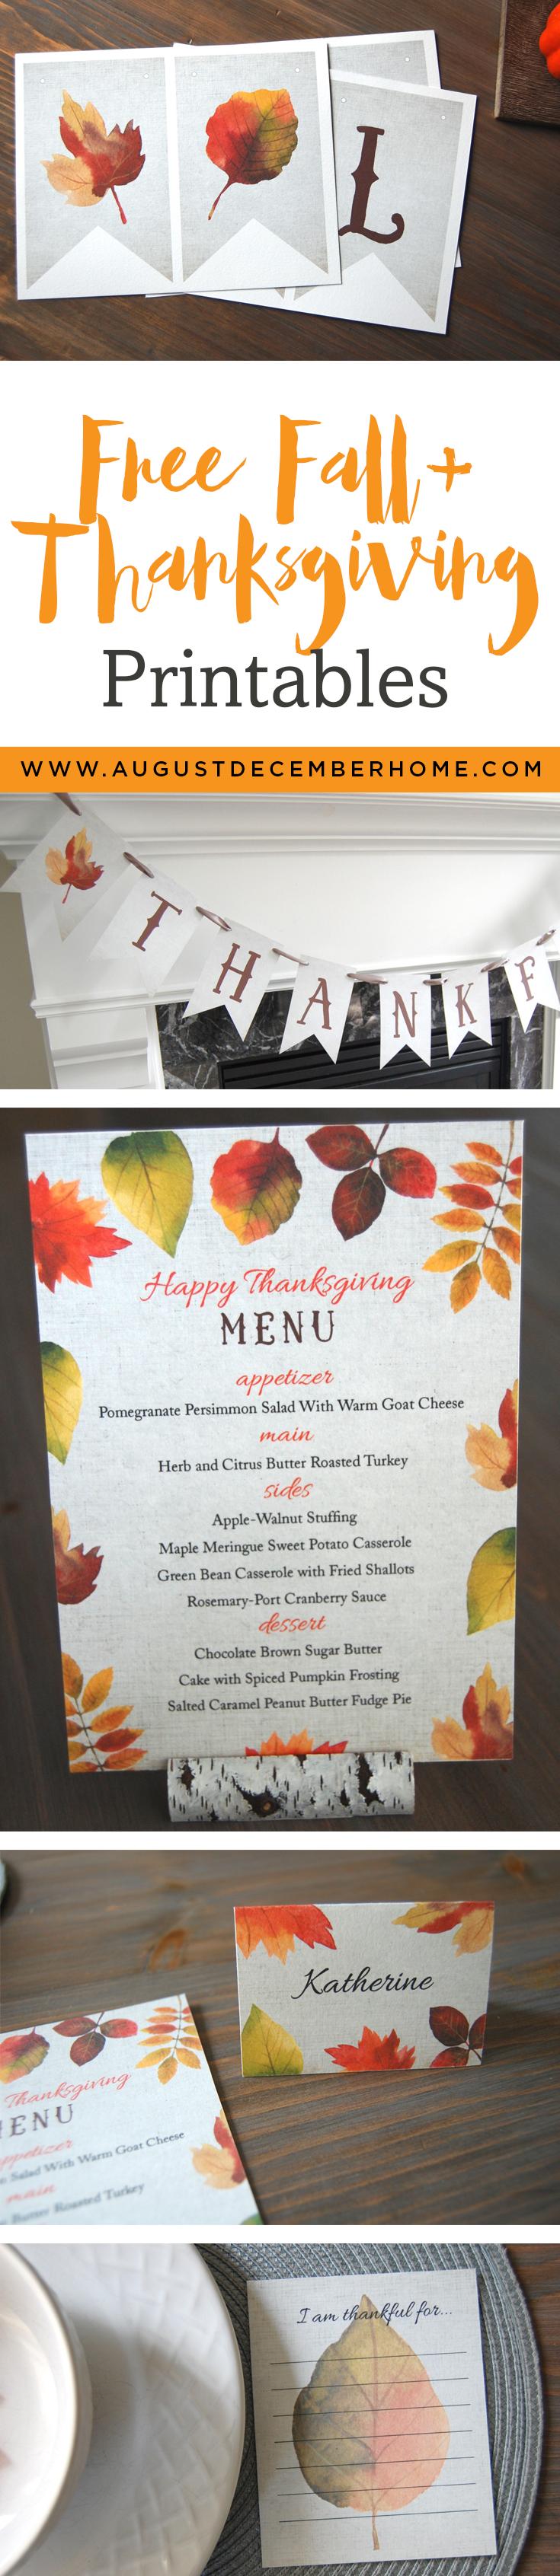 fallprintablespin Free Printable Fall u0026 Thanksgiving Banners